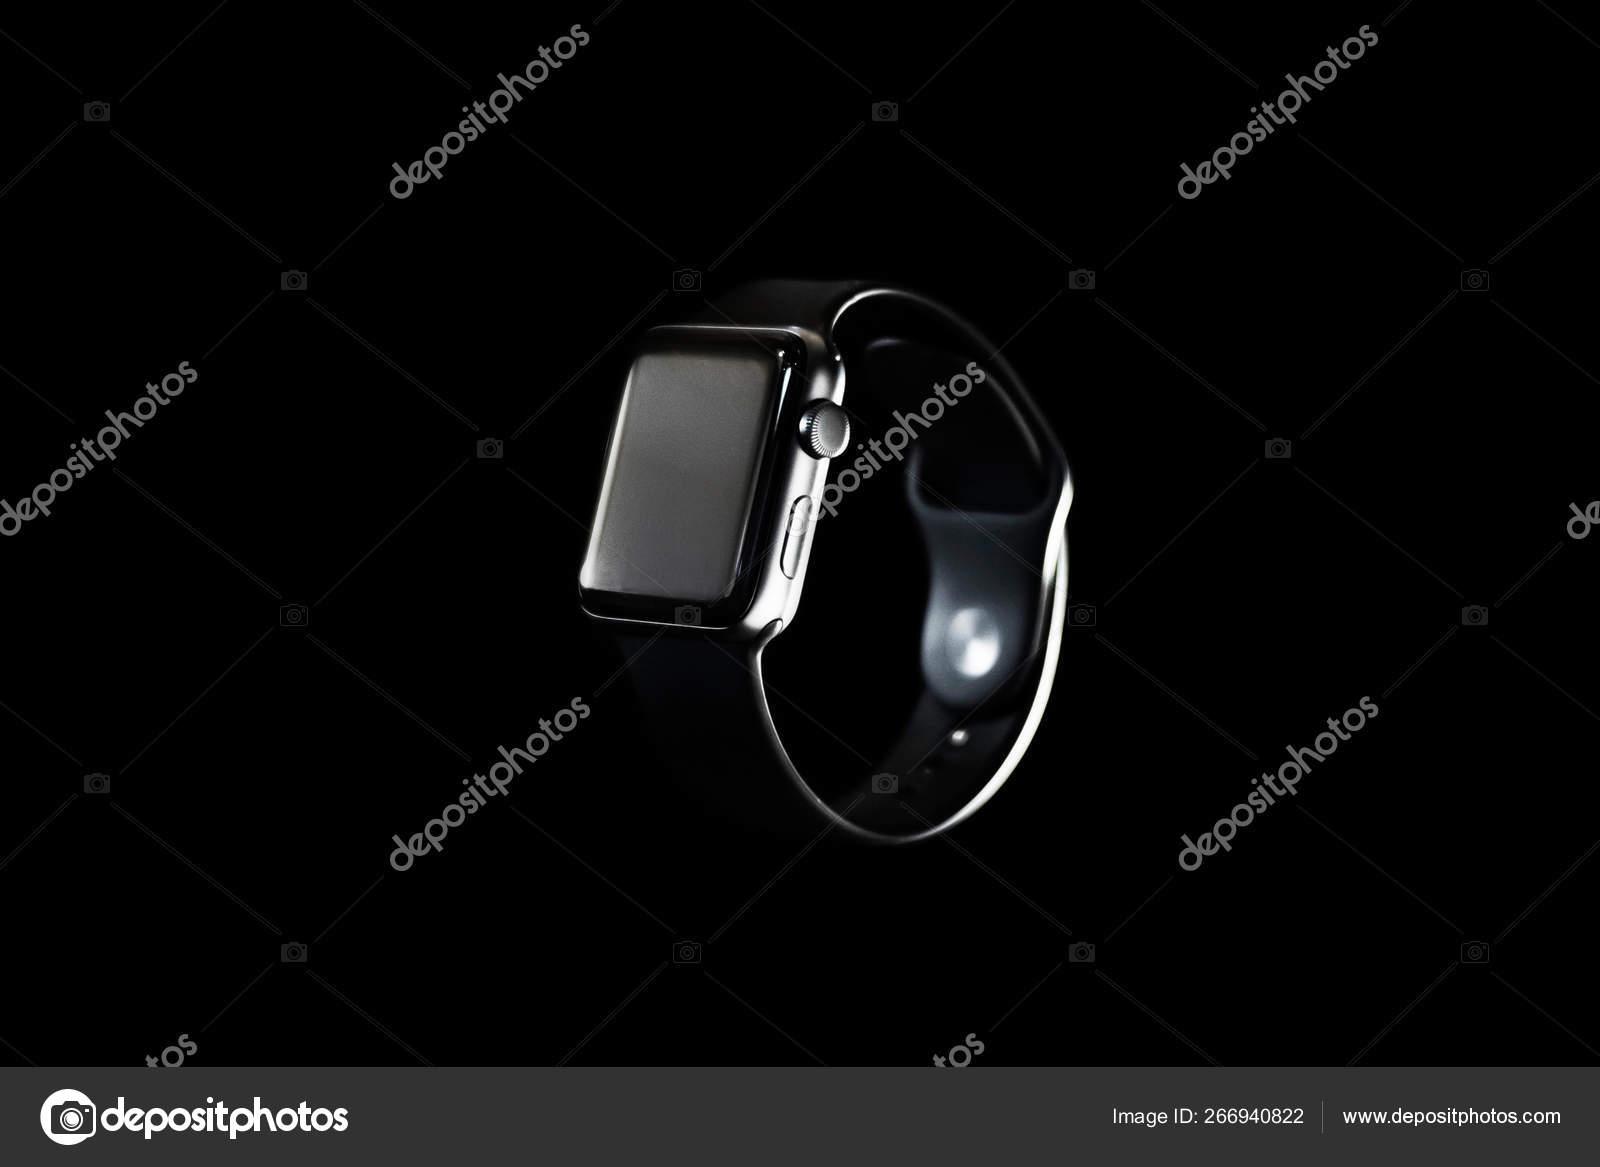 Apple Watch Black Background Hover Air Stock Photo C Devetyarov 266940822